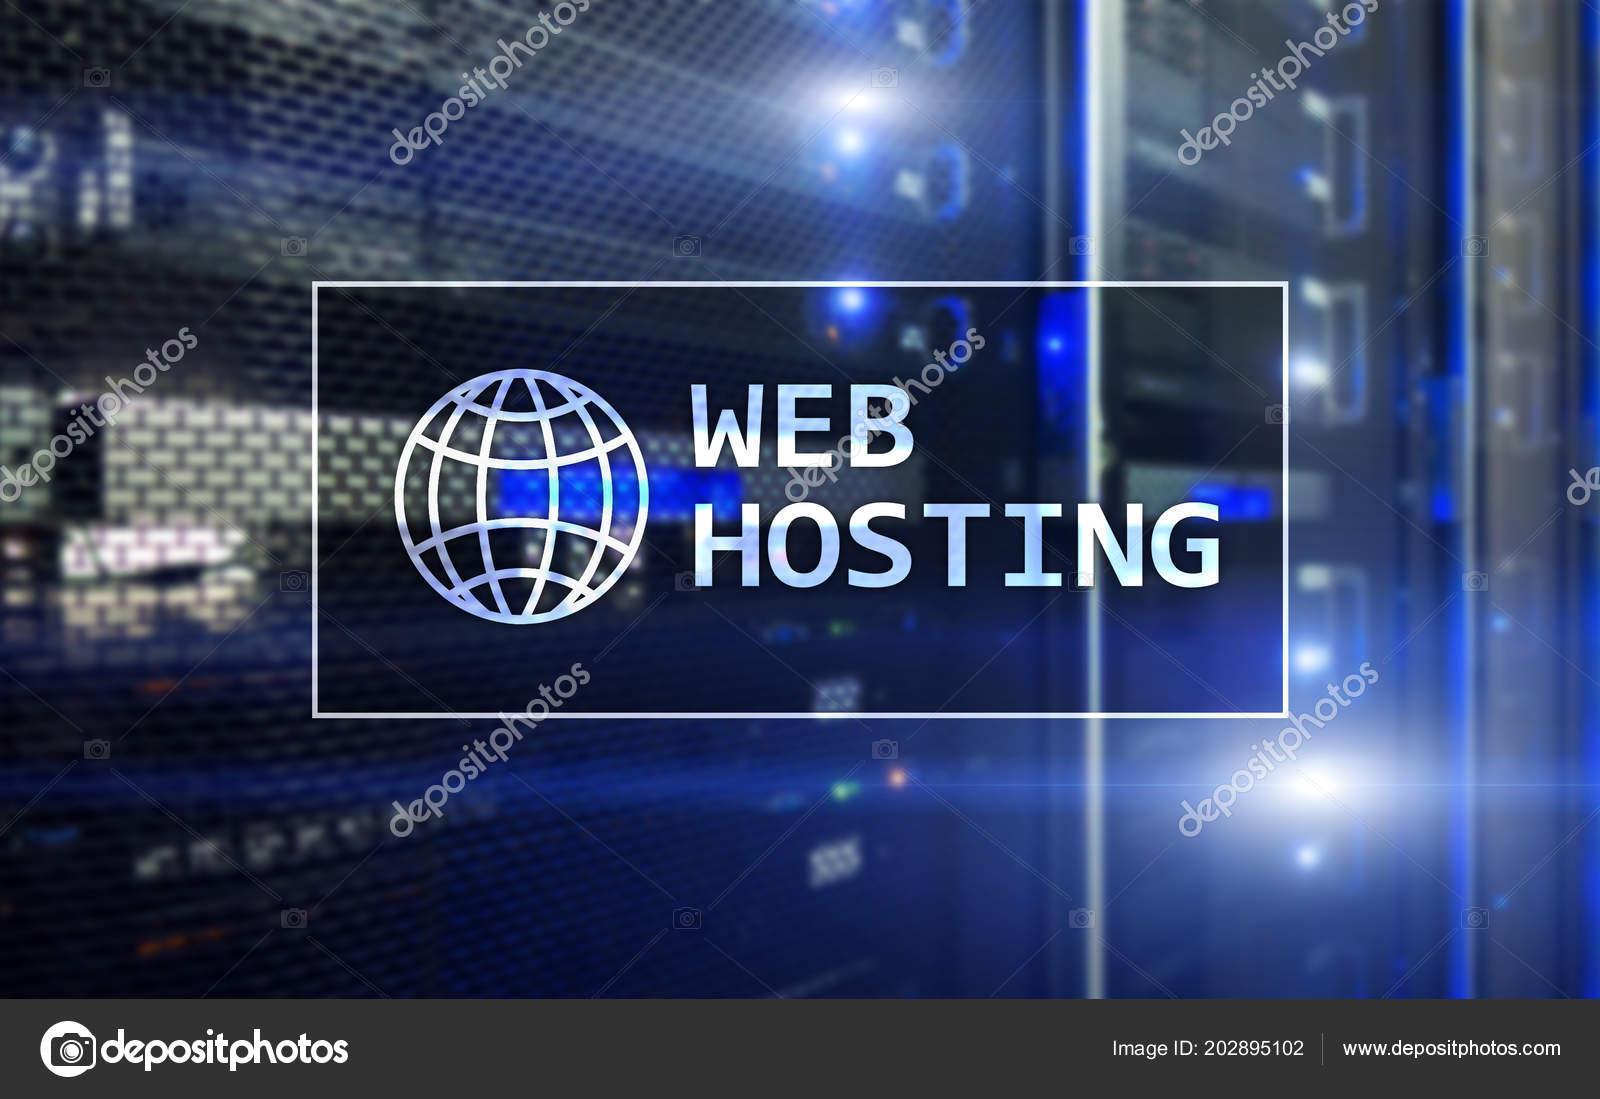 Space хостинг регистрация домена рф и хостинг